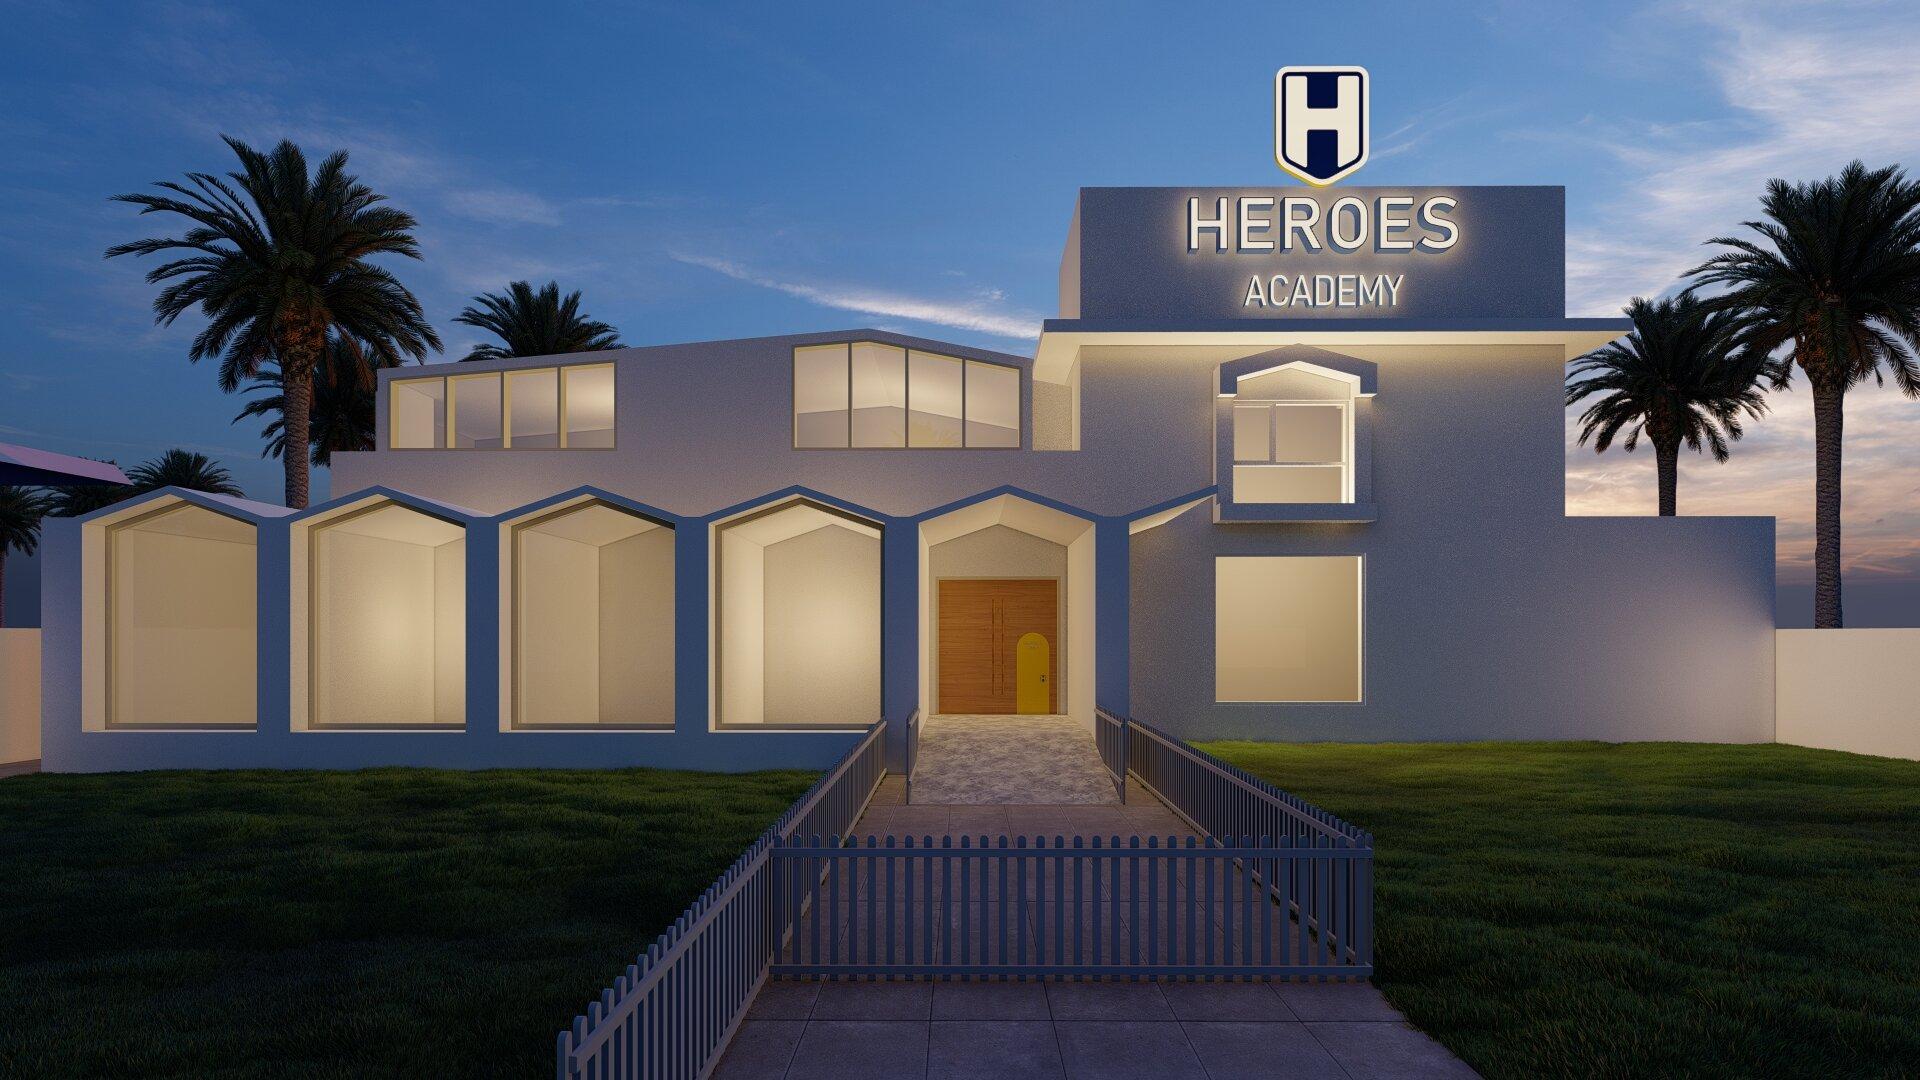 Heroes Academy